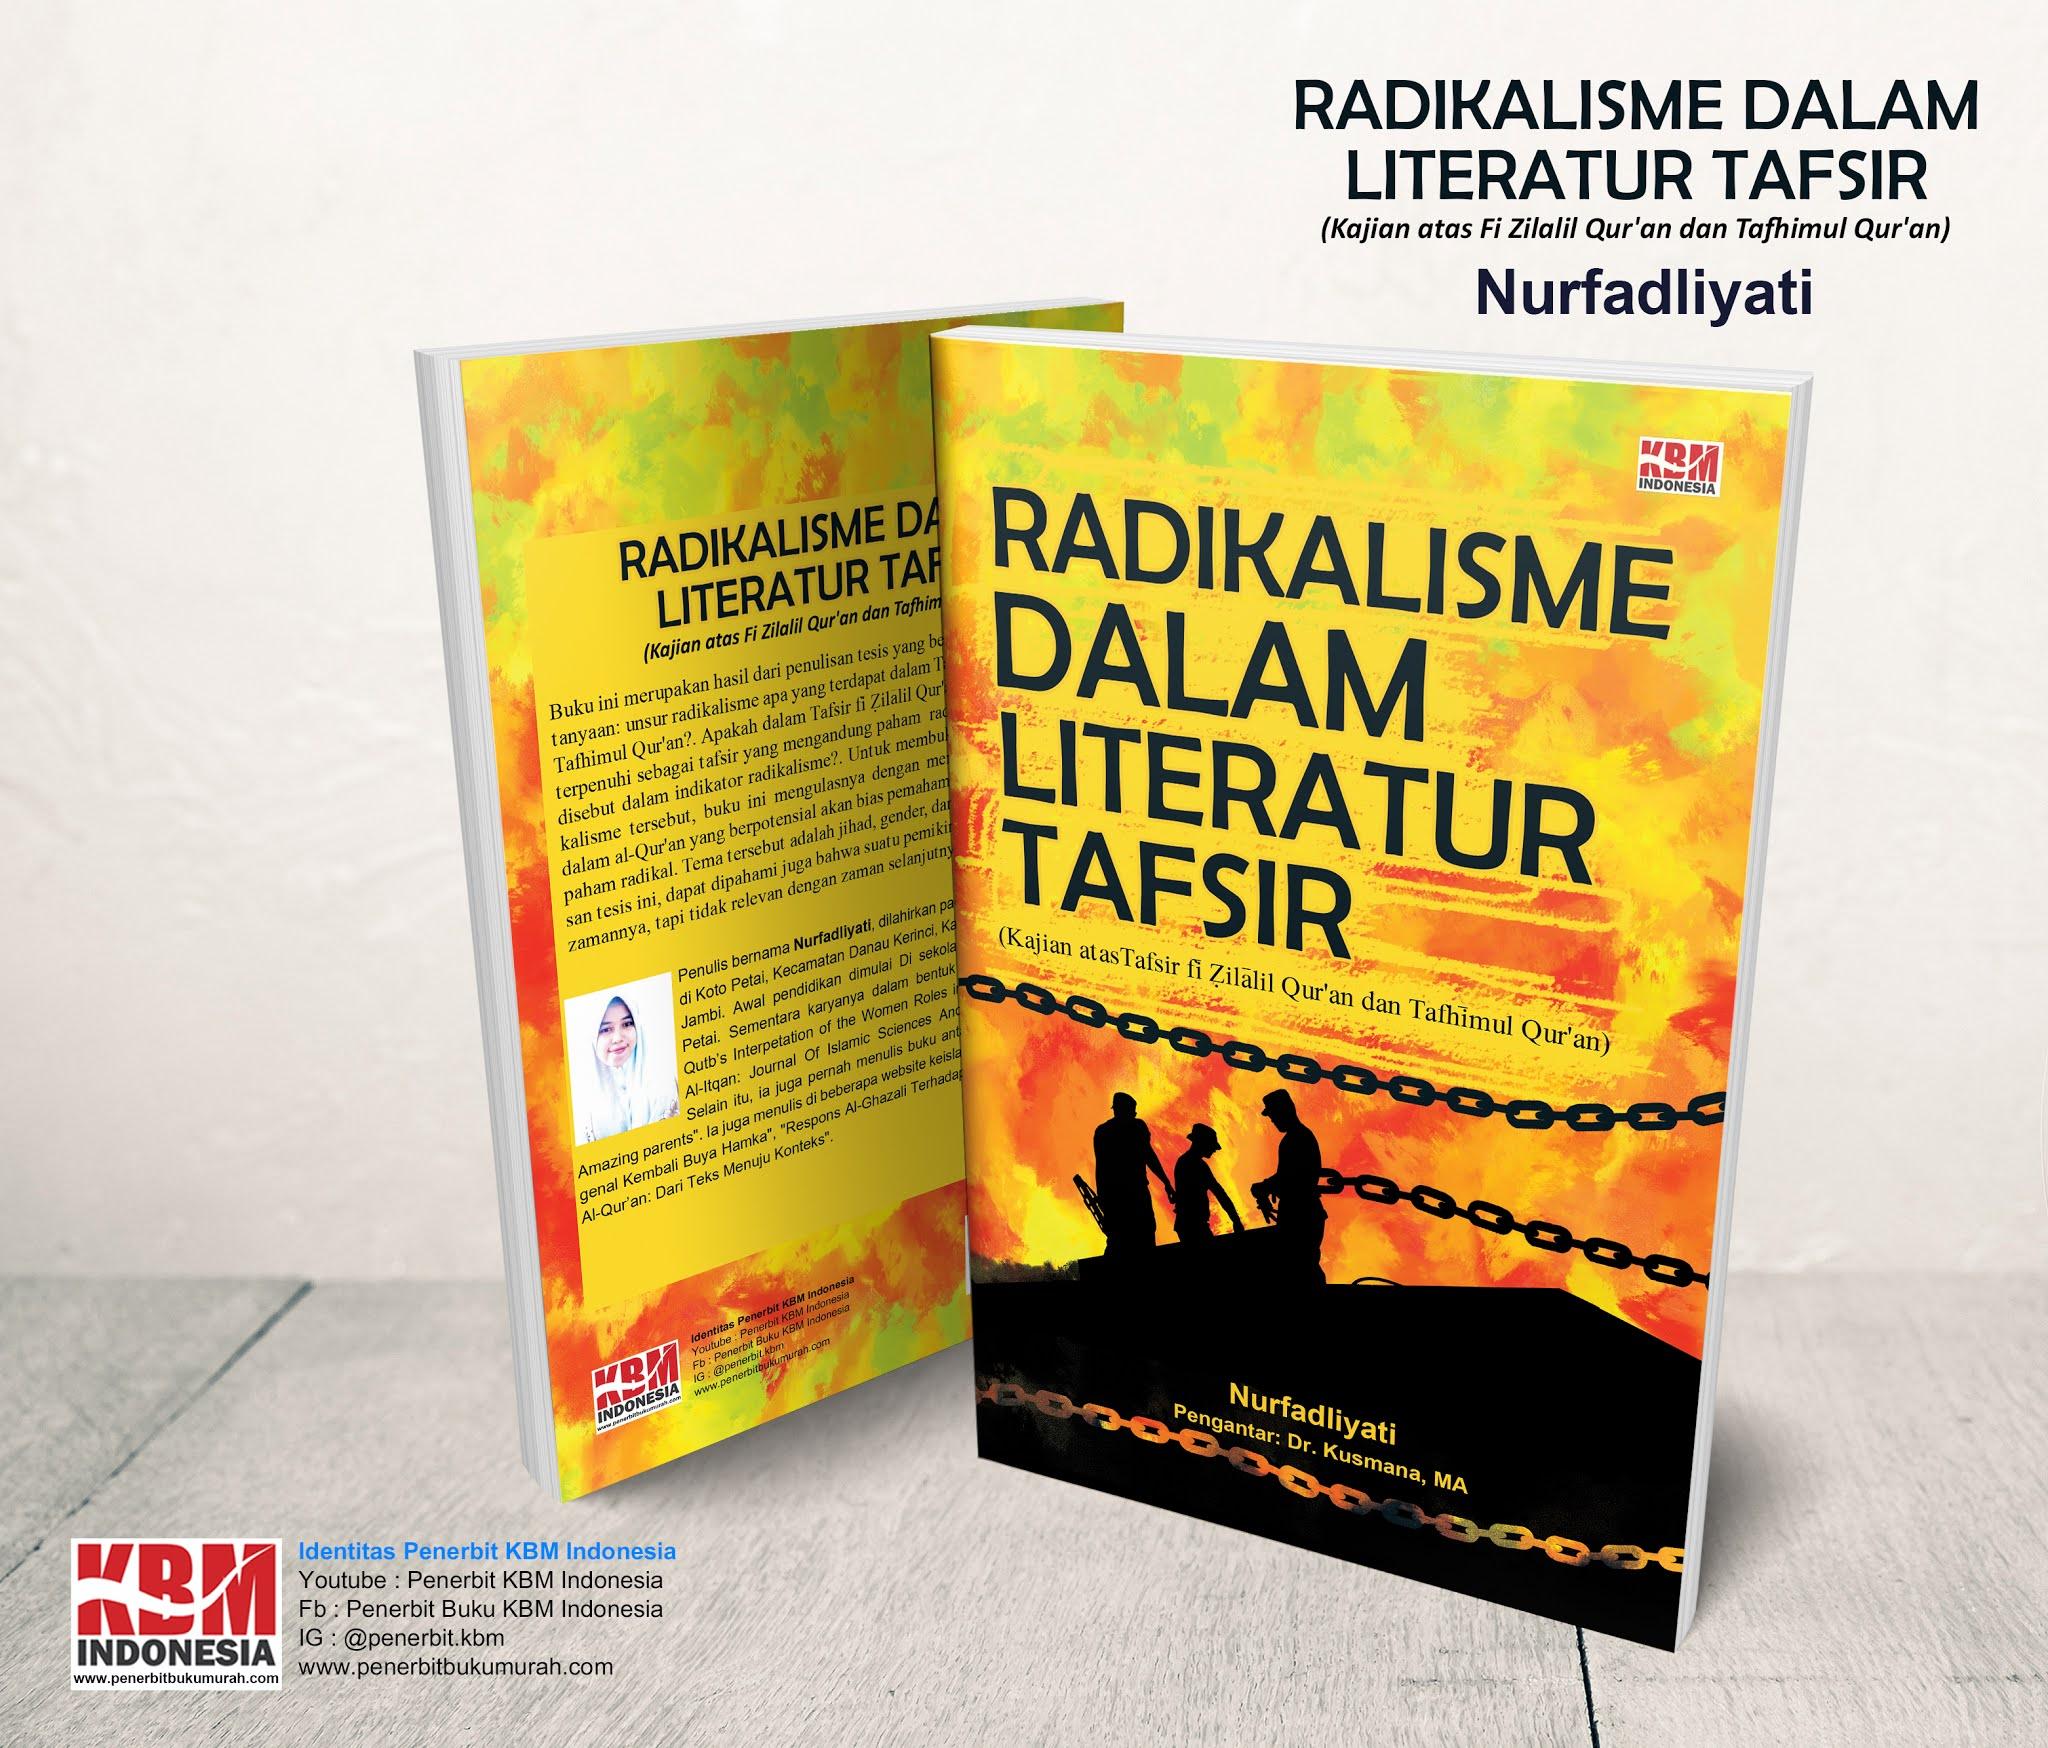 RADIKALISME DALAM LITERATUR TAFSIR